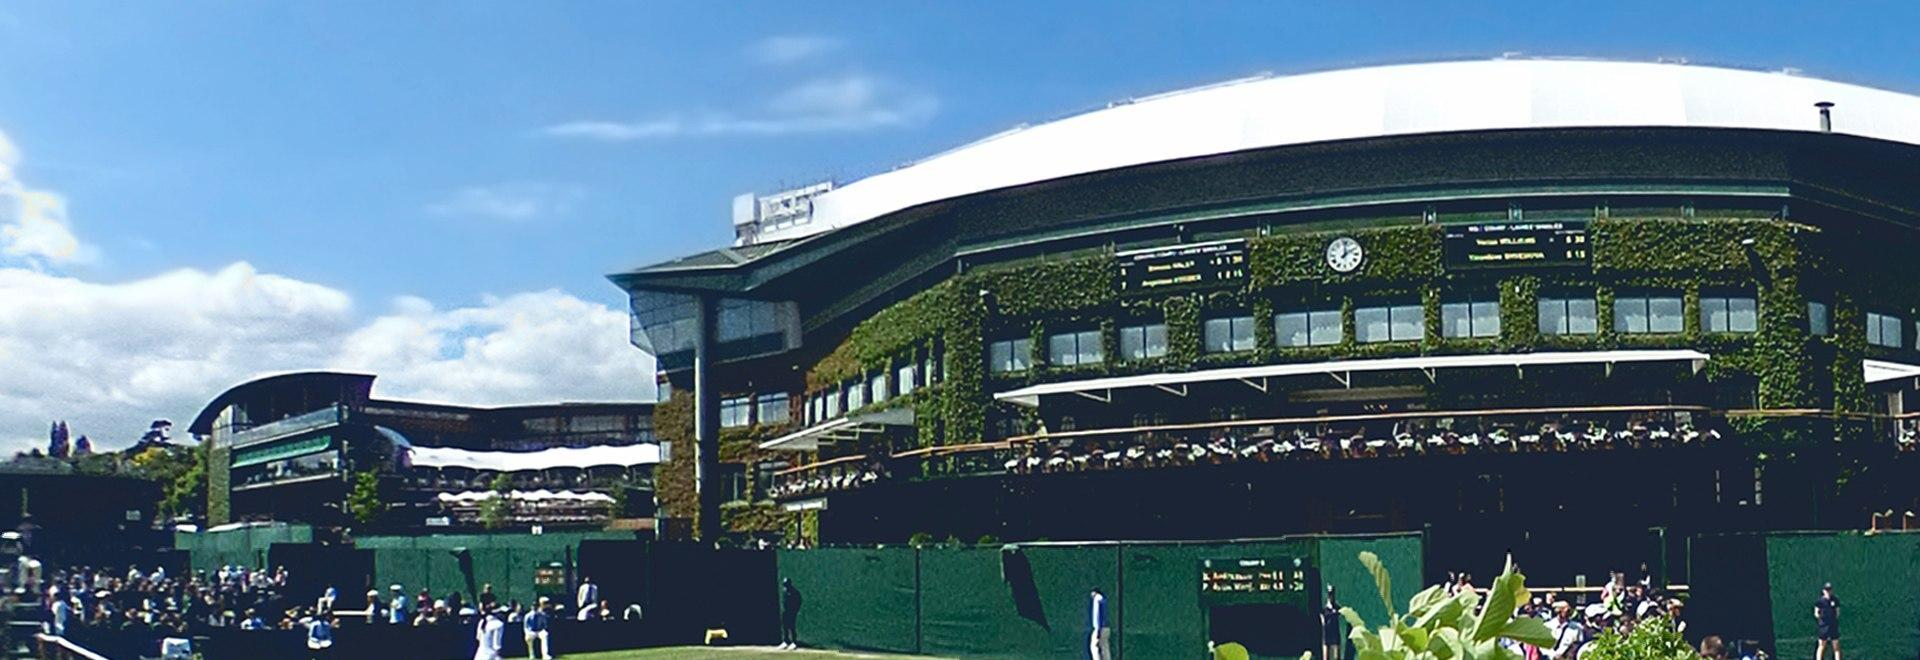 Wimbledon 2009: Federer - Roddick. Finale M